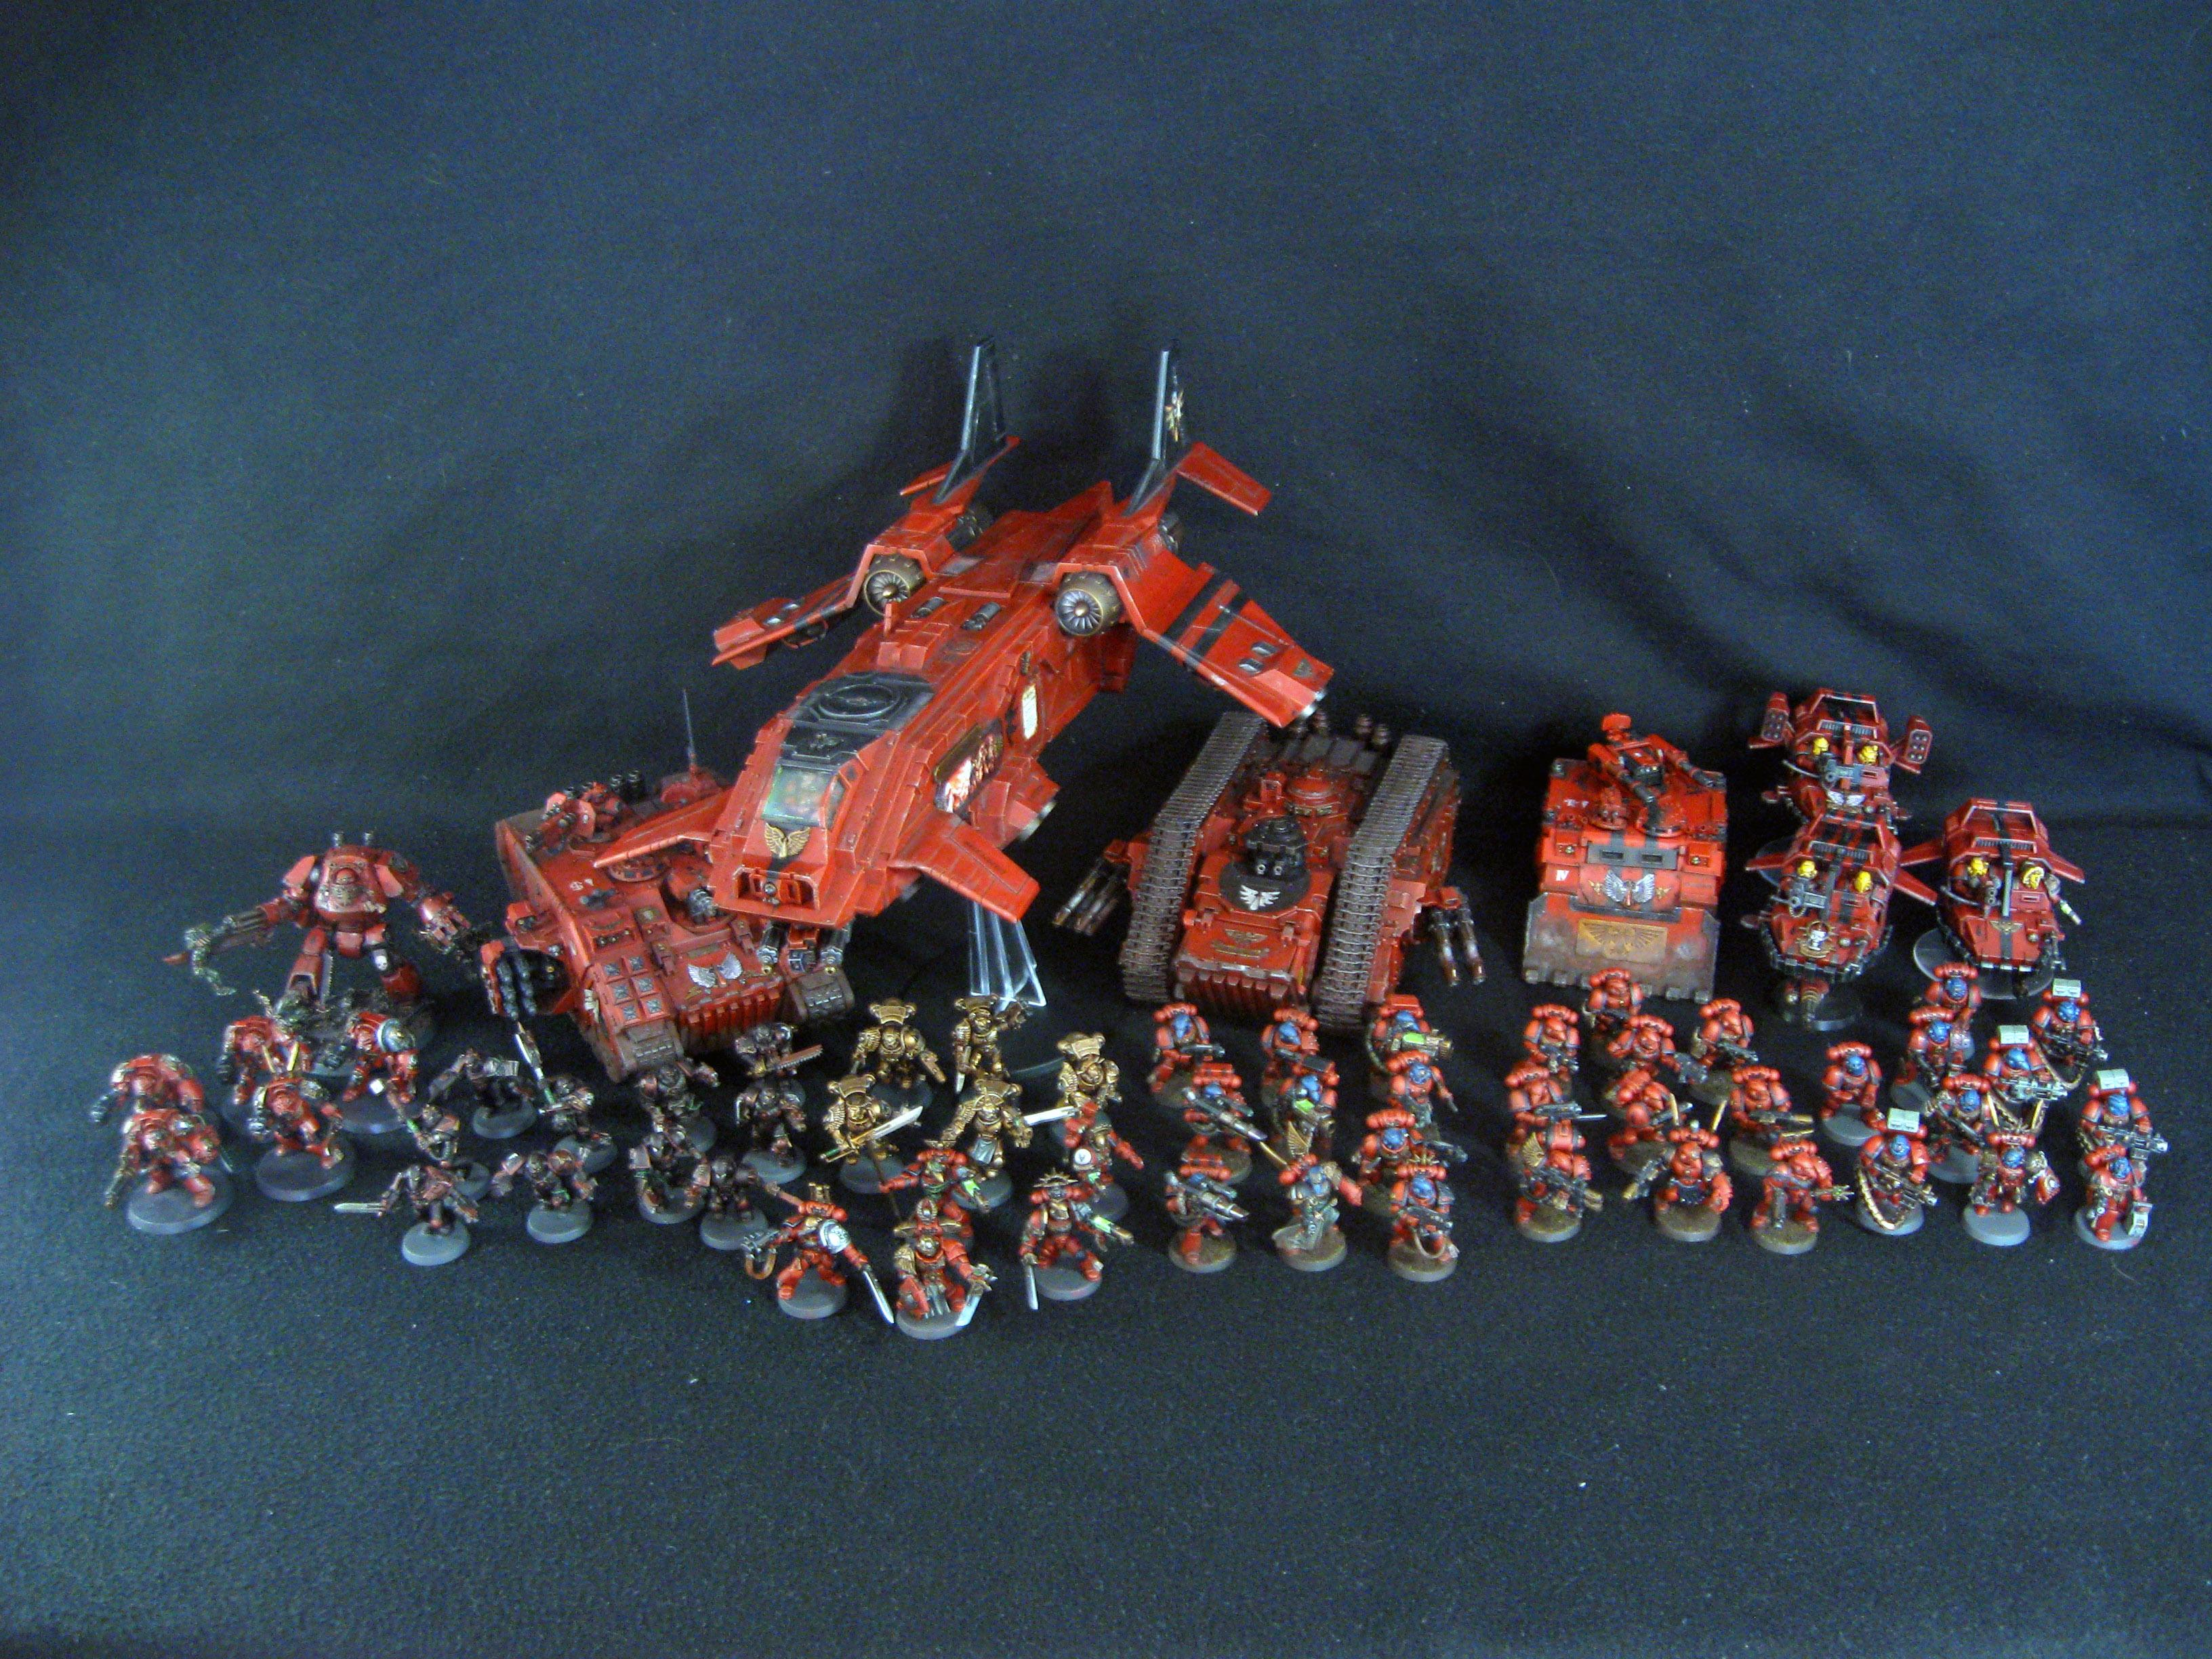 Angel, Blood, Death, Devastator, Forge World, Guard, Honour, Meph, Sanguinary, Space Marines, Terminator Armor